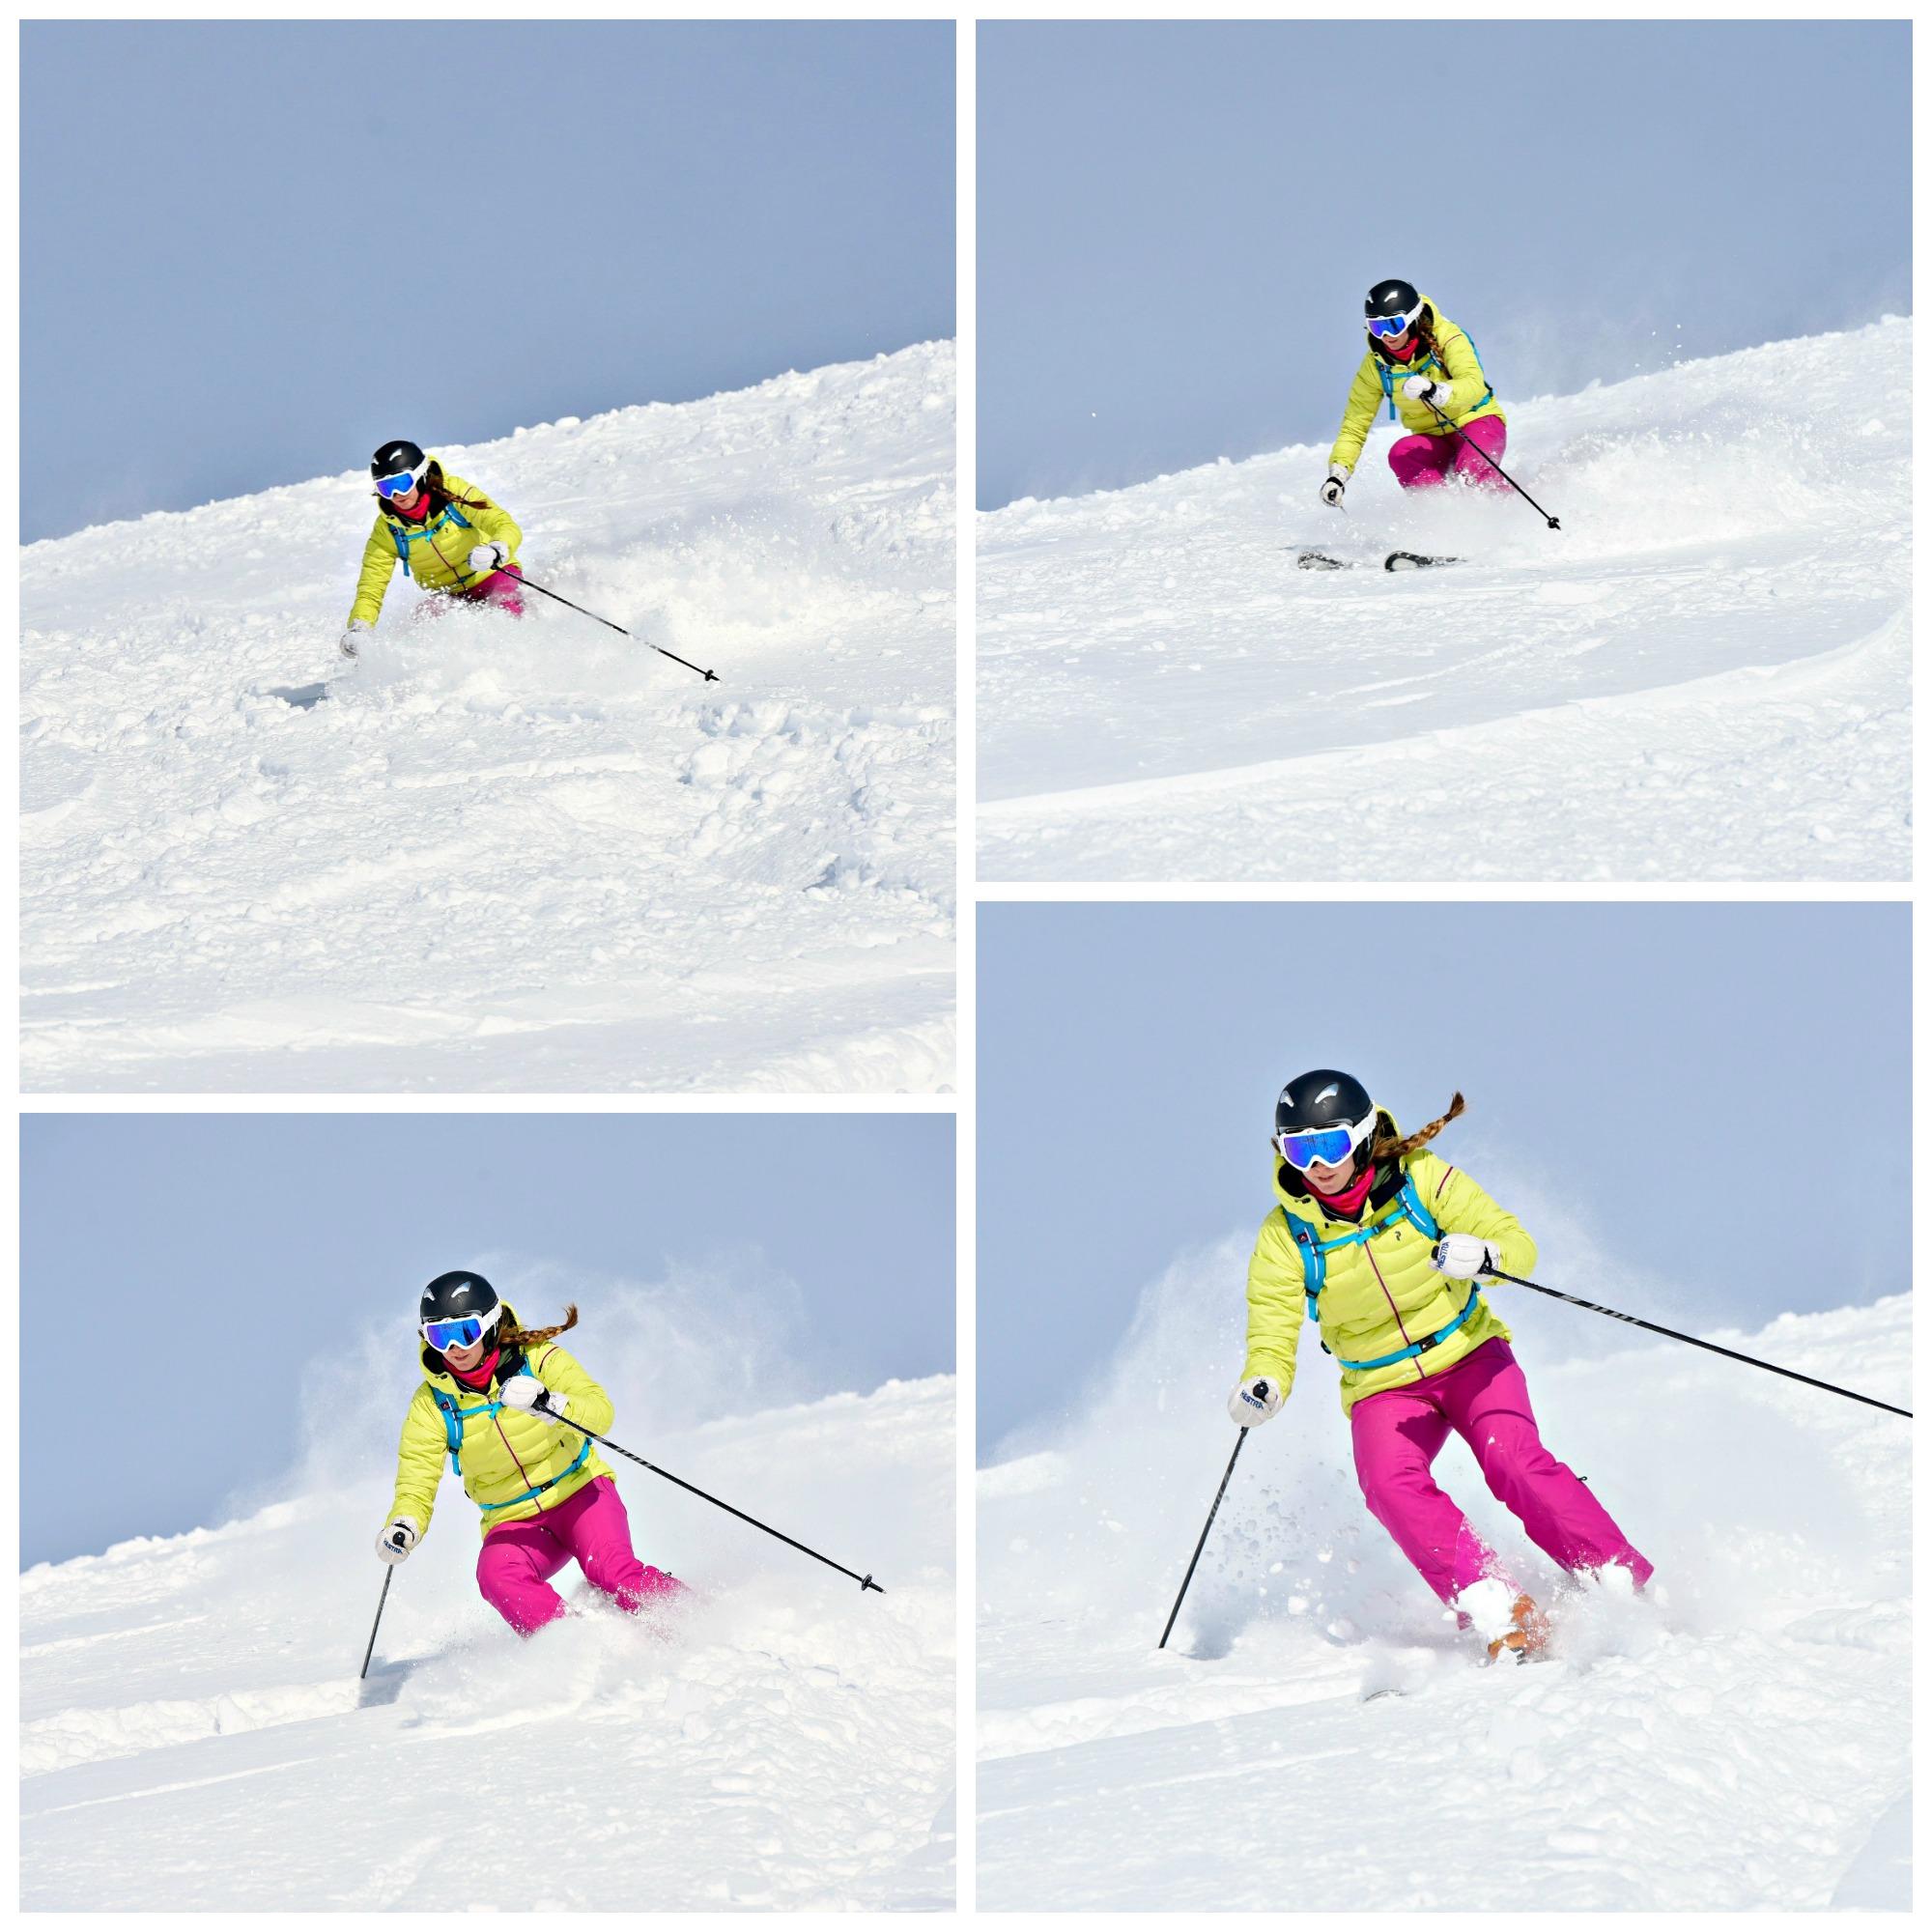 Fitnessblog-kästle-ski-klara-fuchs-österreich-blogger-sport-winter23-collage